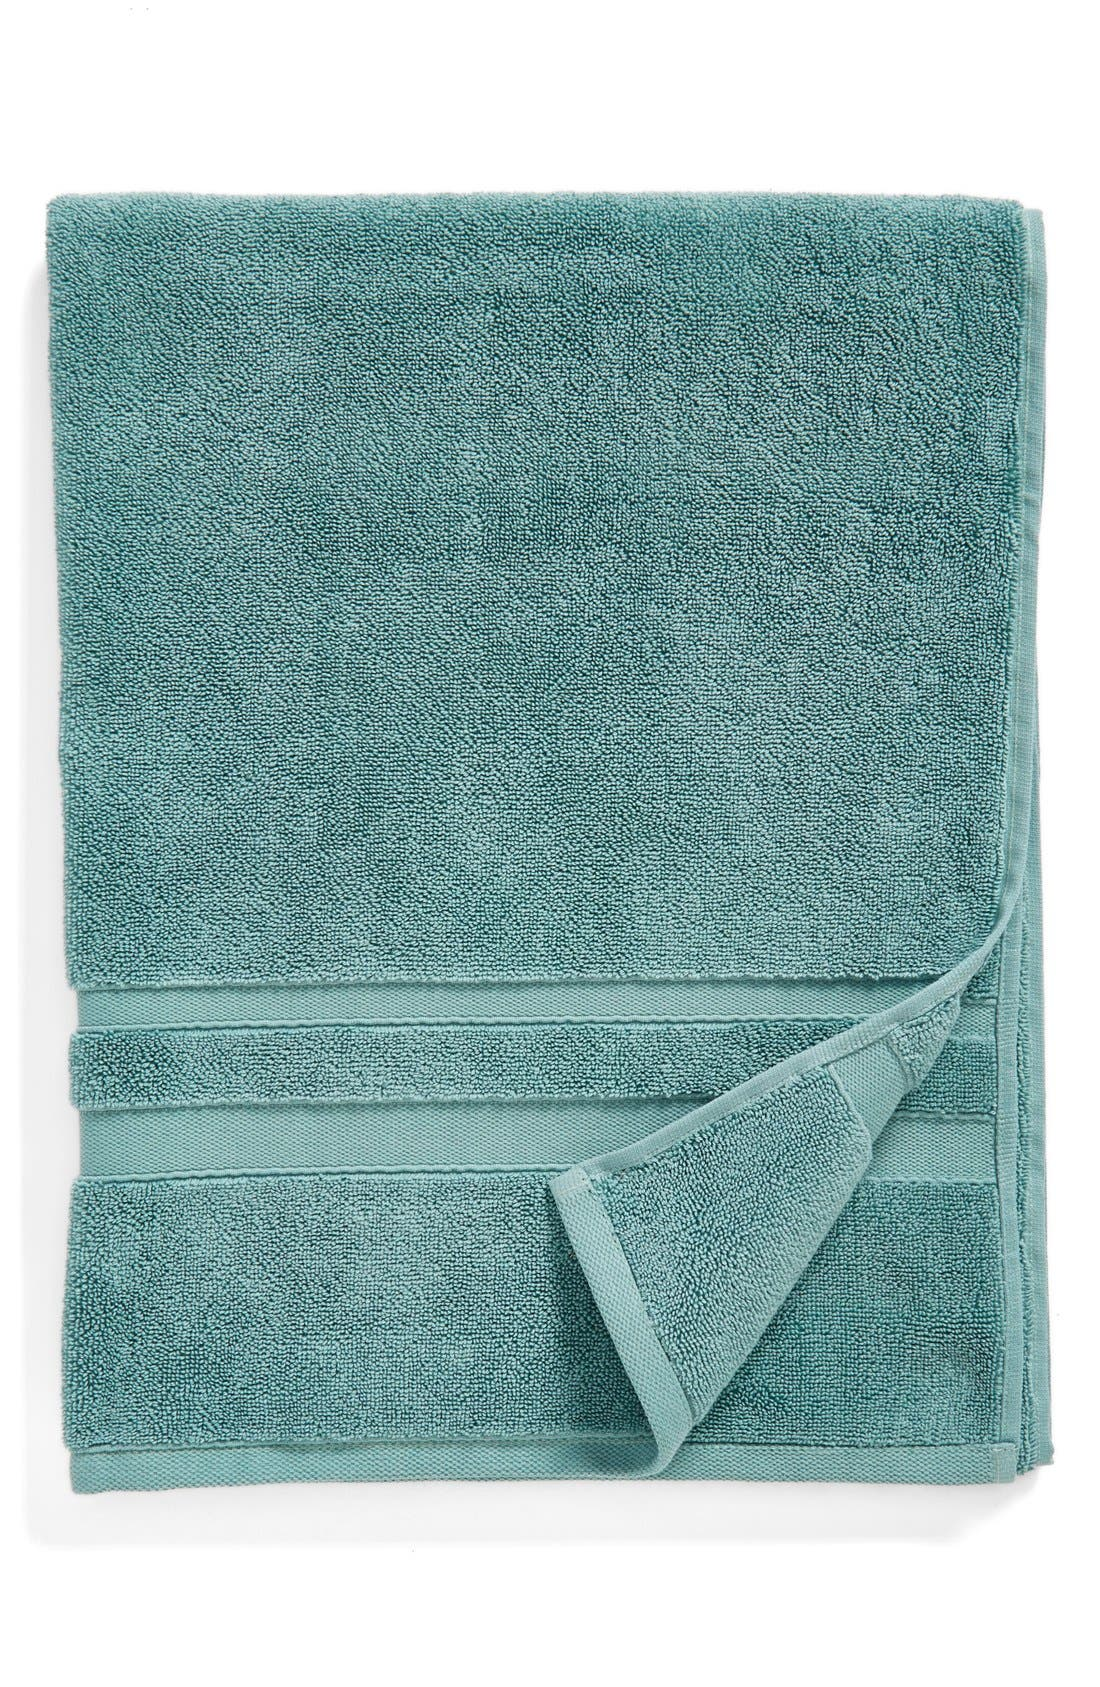 Main Image - Waterworks Studio 'Perennial' Turkish Cotton Bath Towel (Online Only)